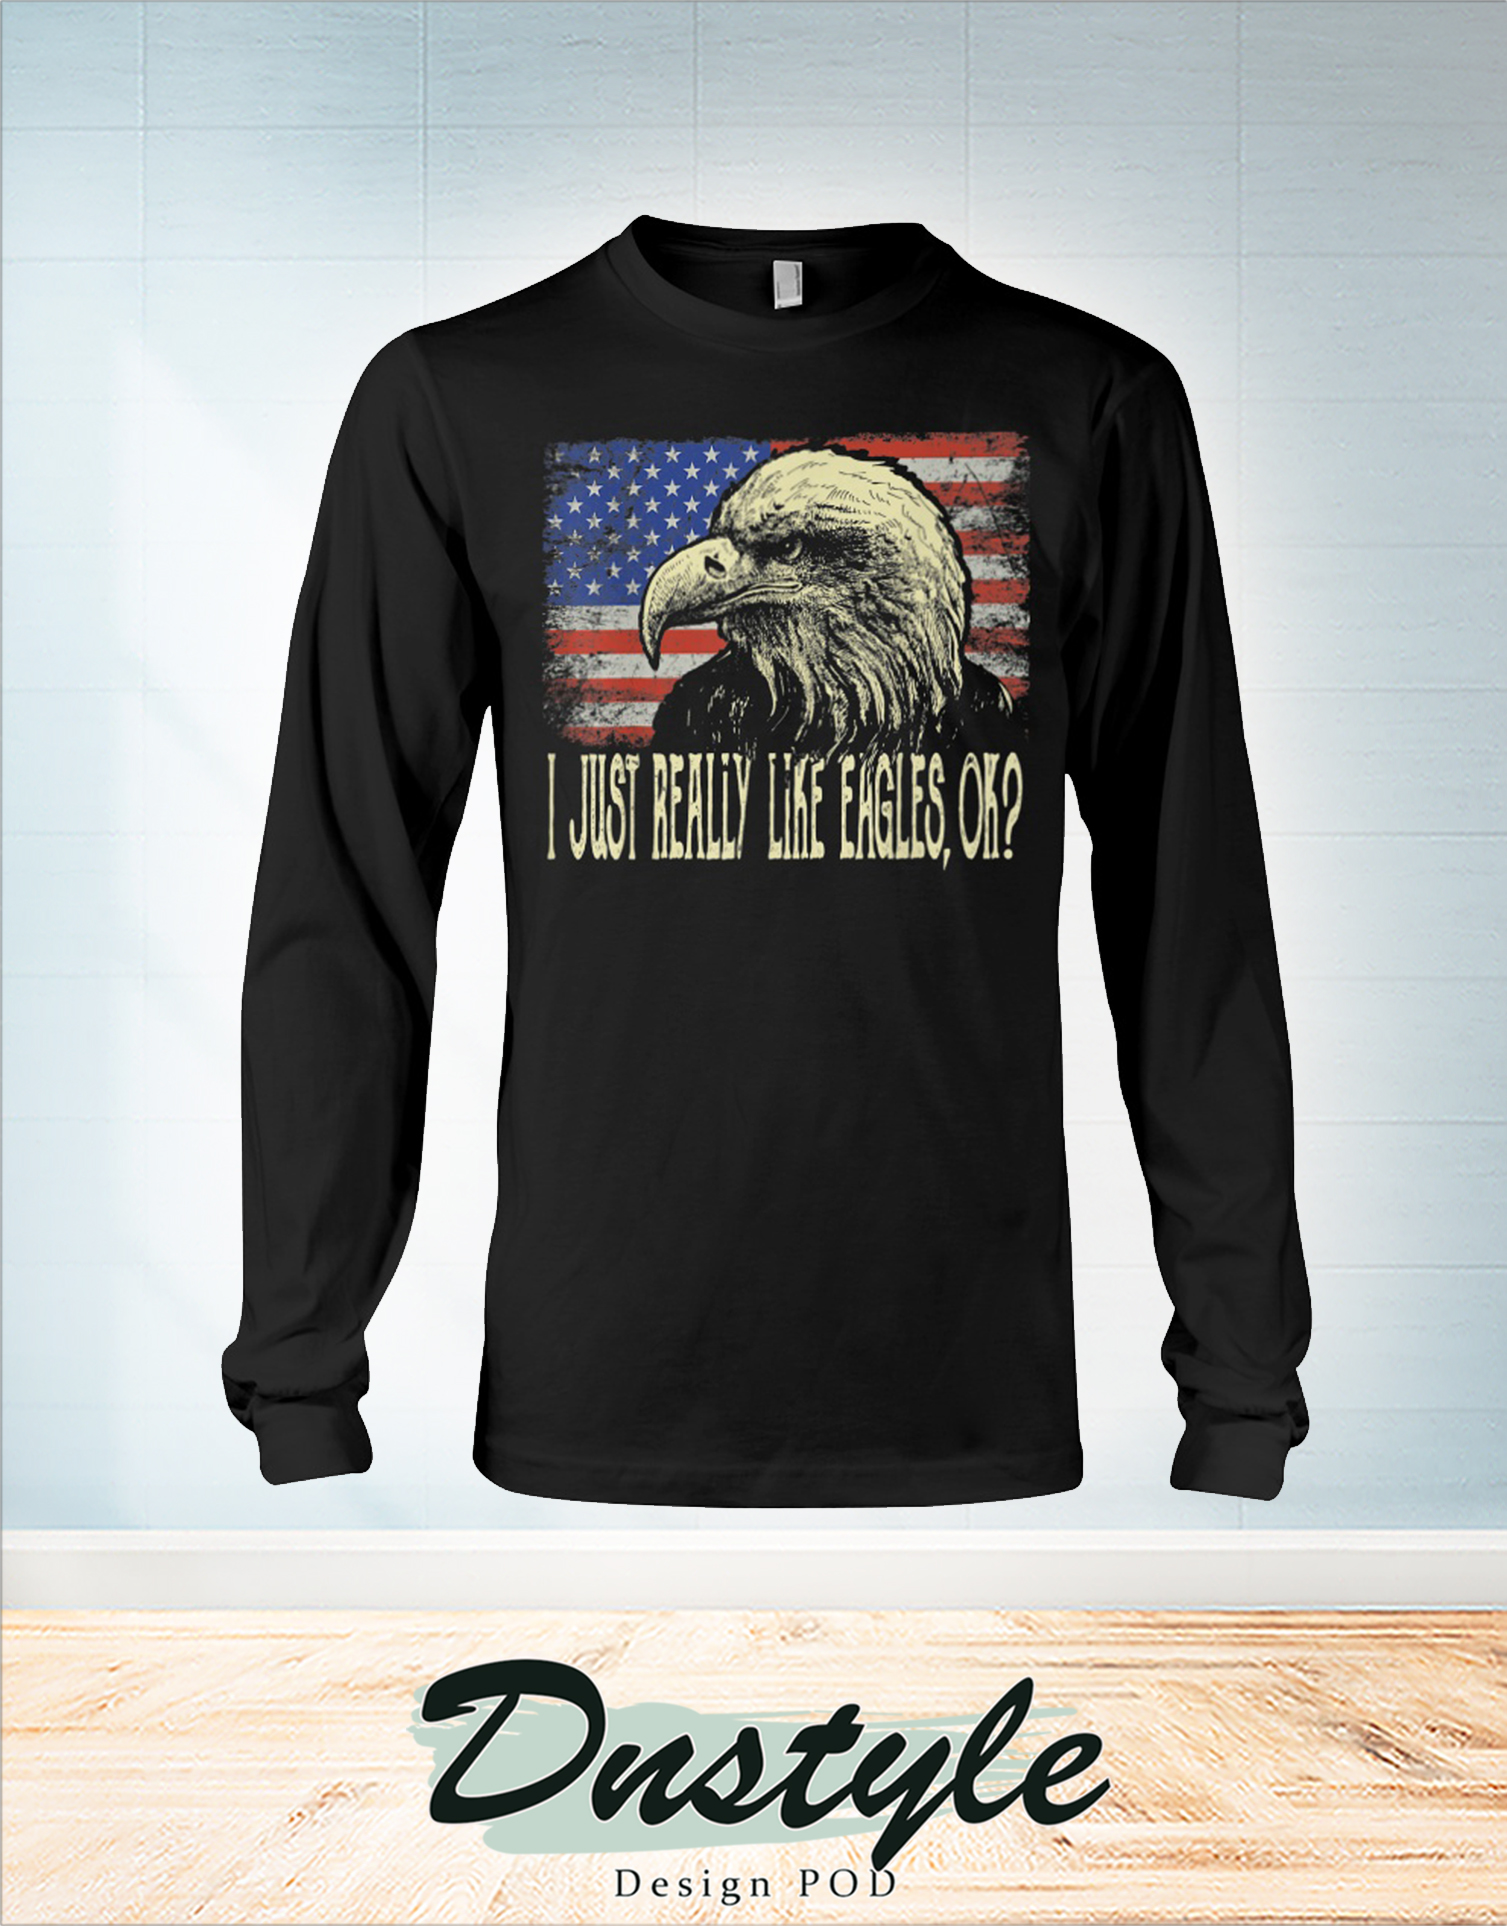 I just really like eagles ok 4th of july long sleeve